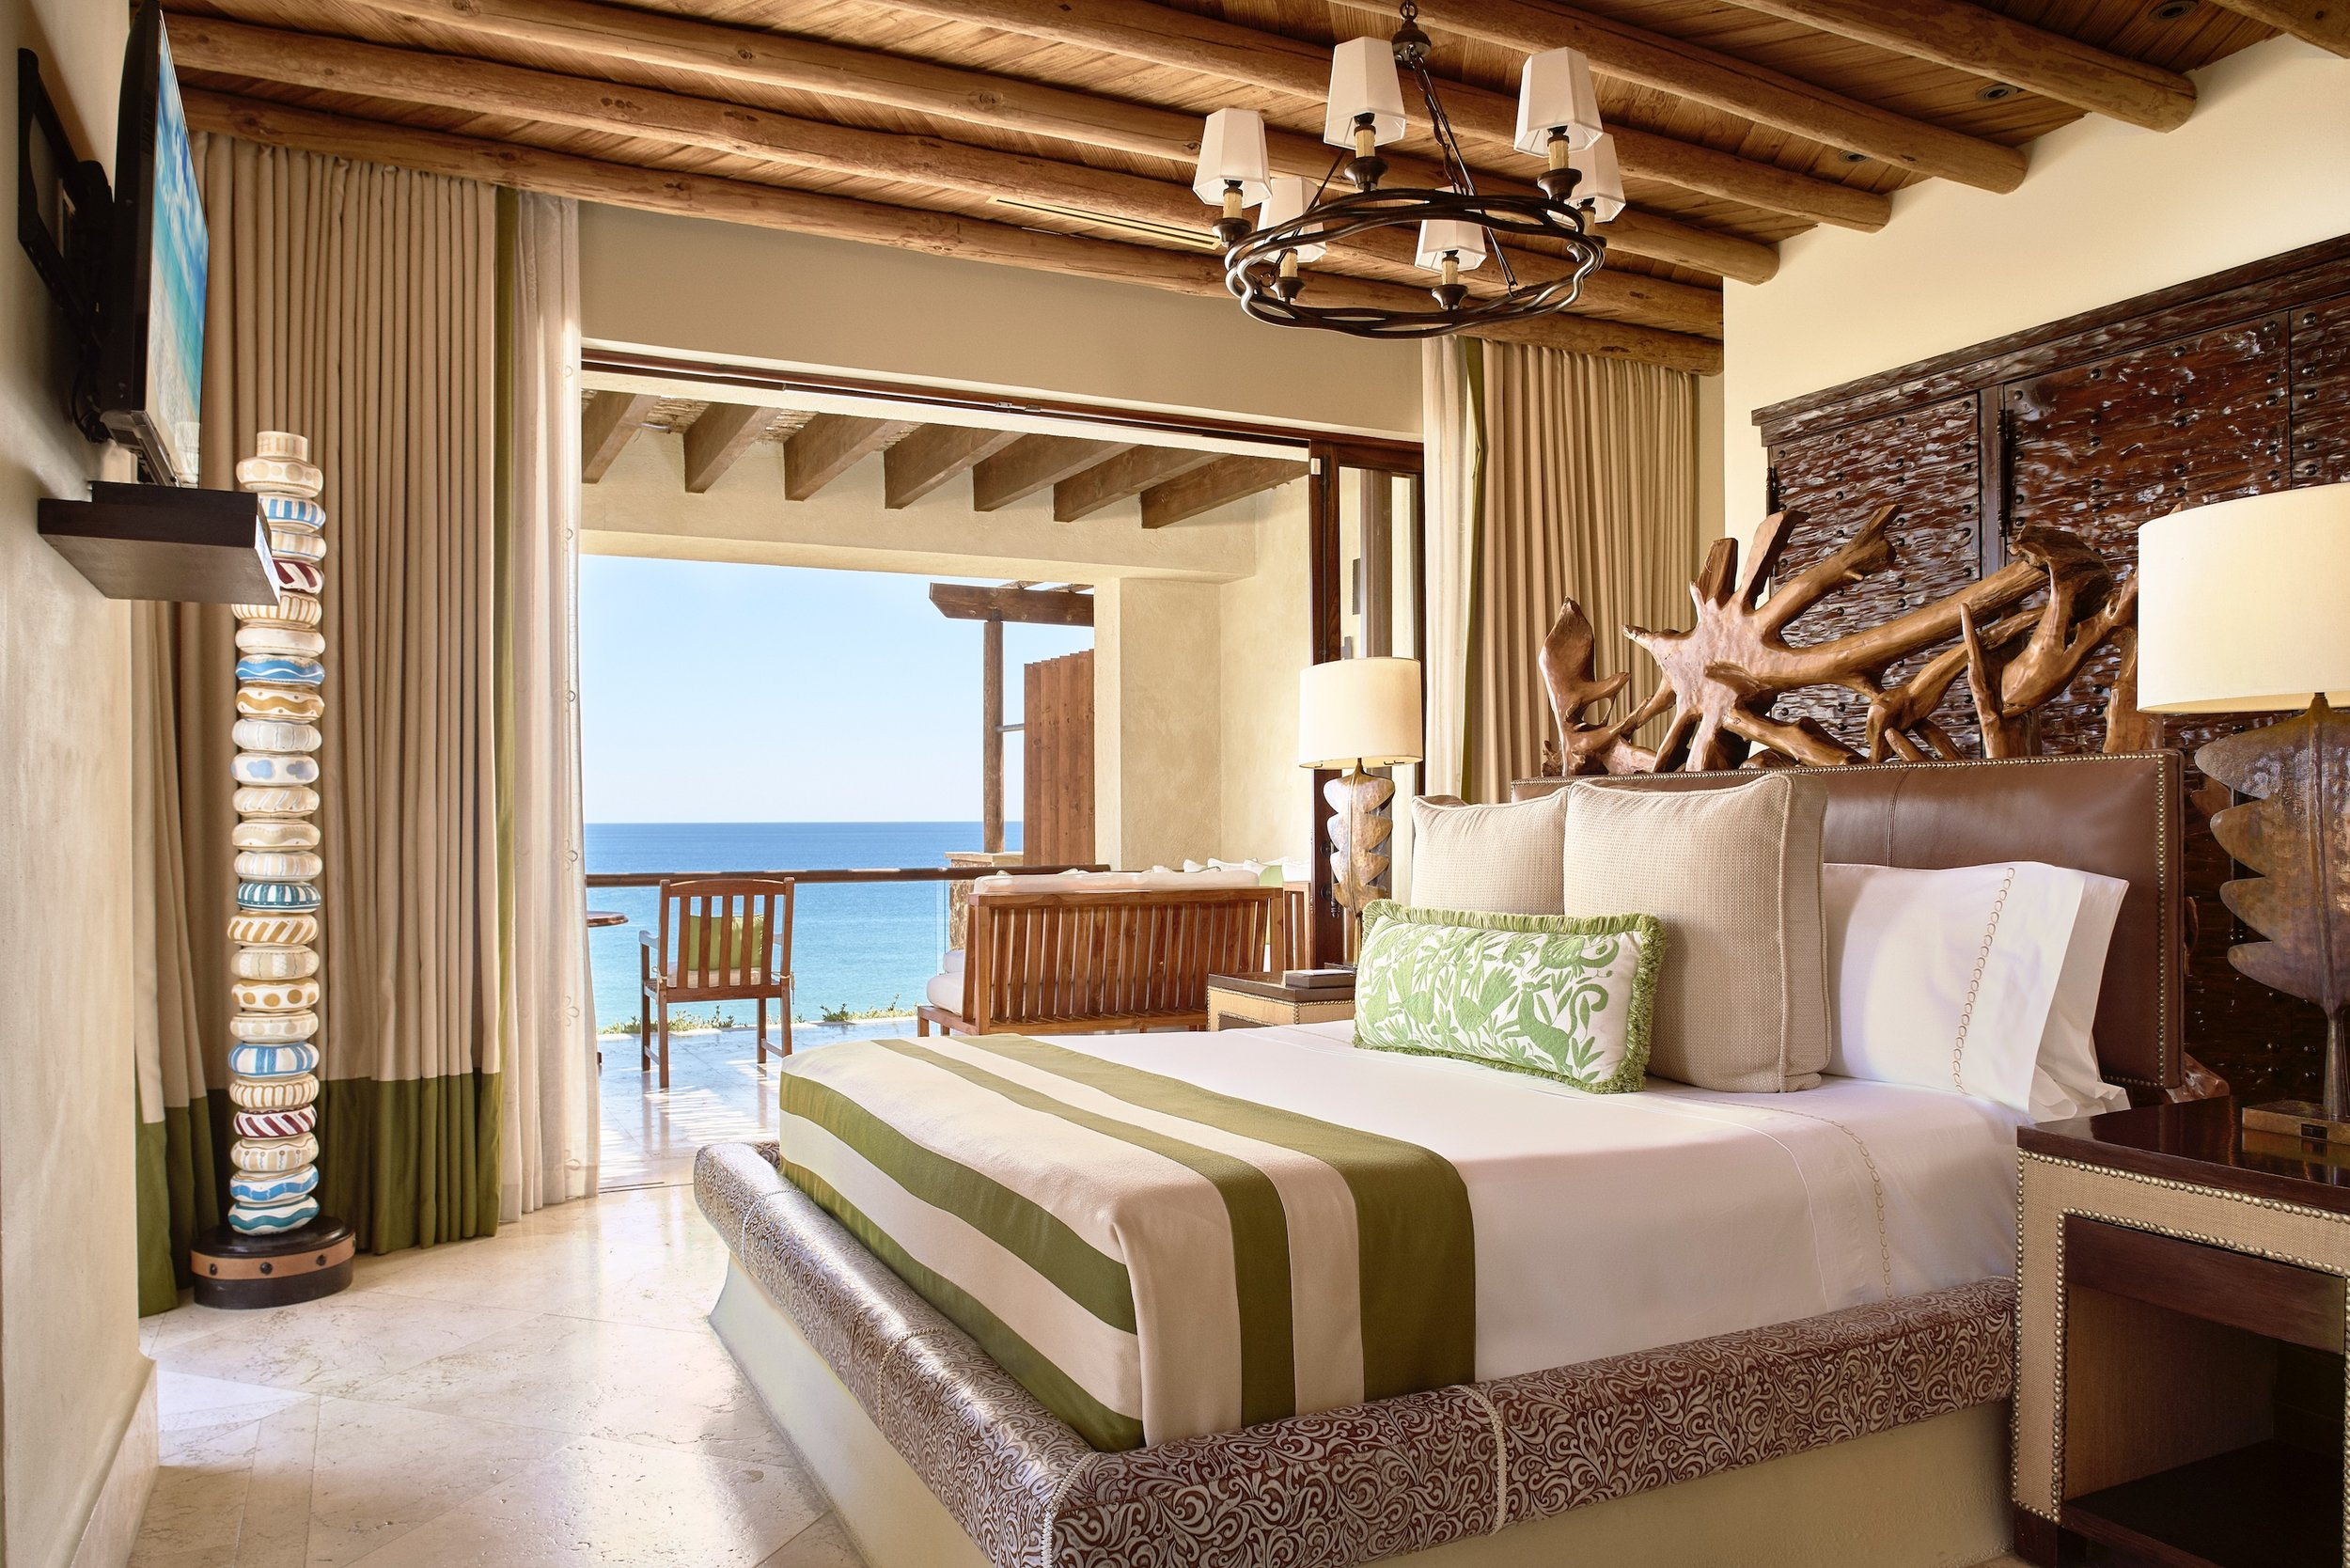 20180320-154252 Resort at Pedregal 19638.jpg